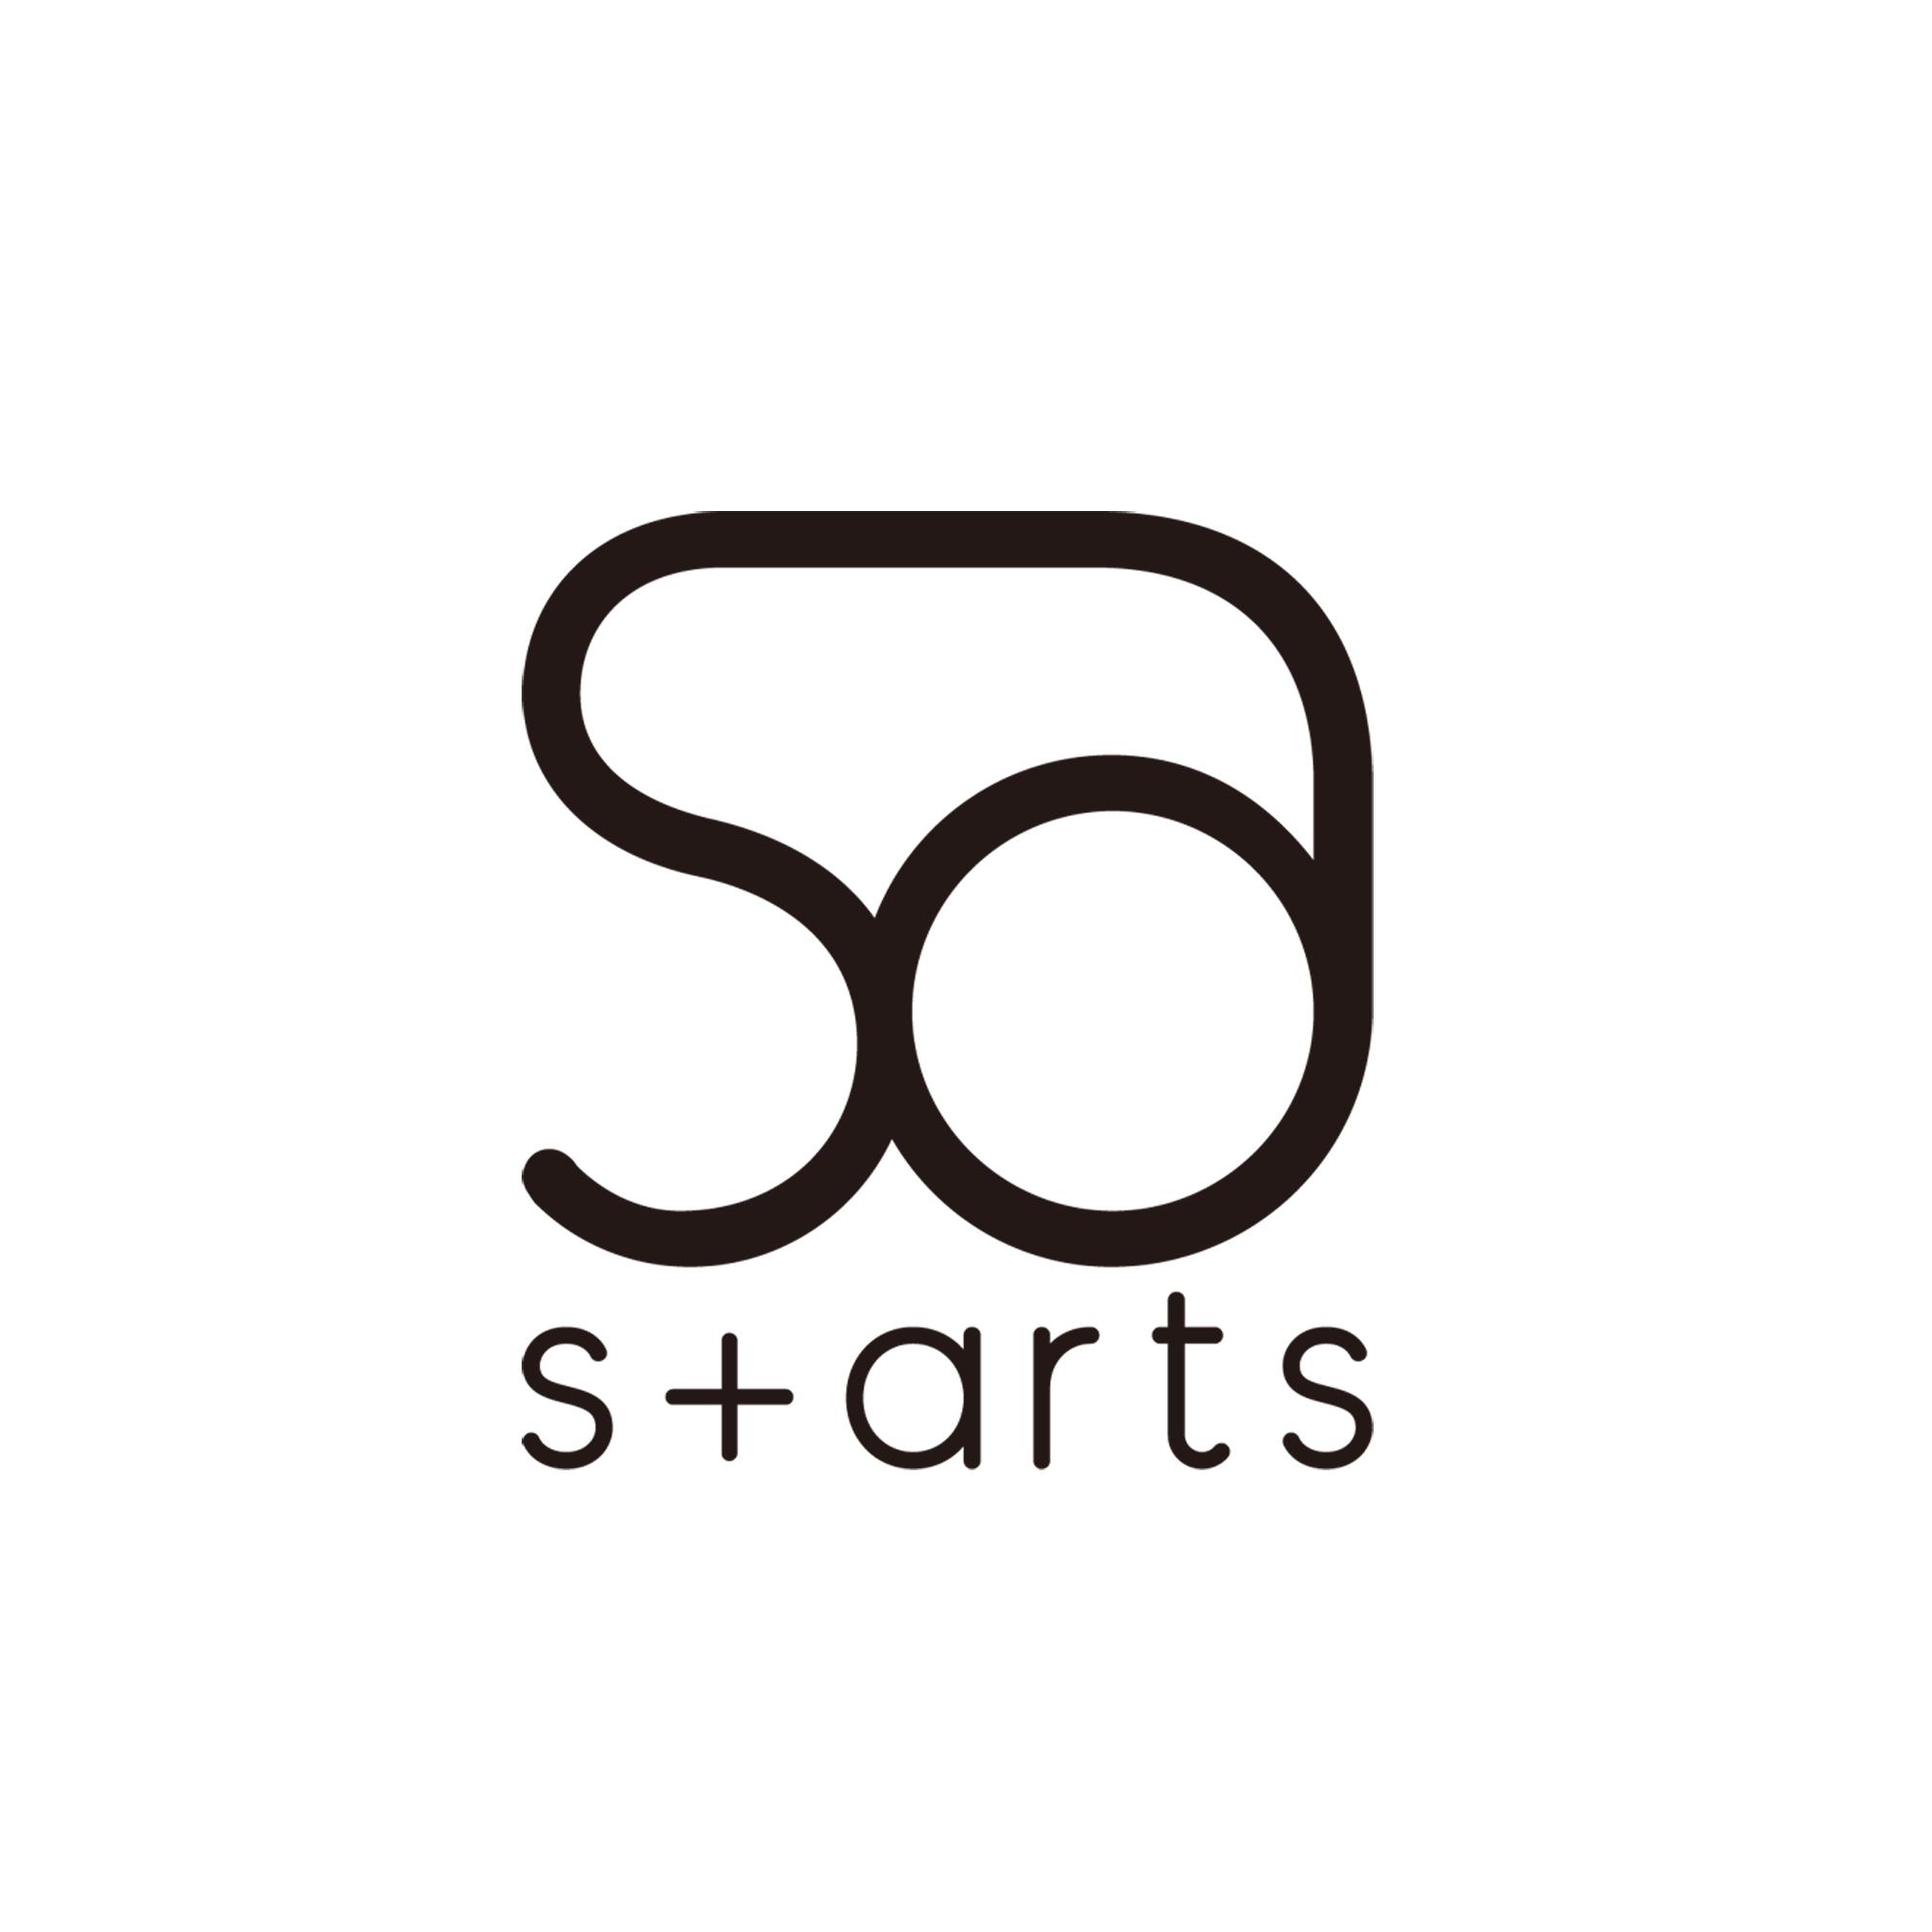 s+arts